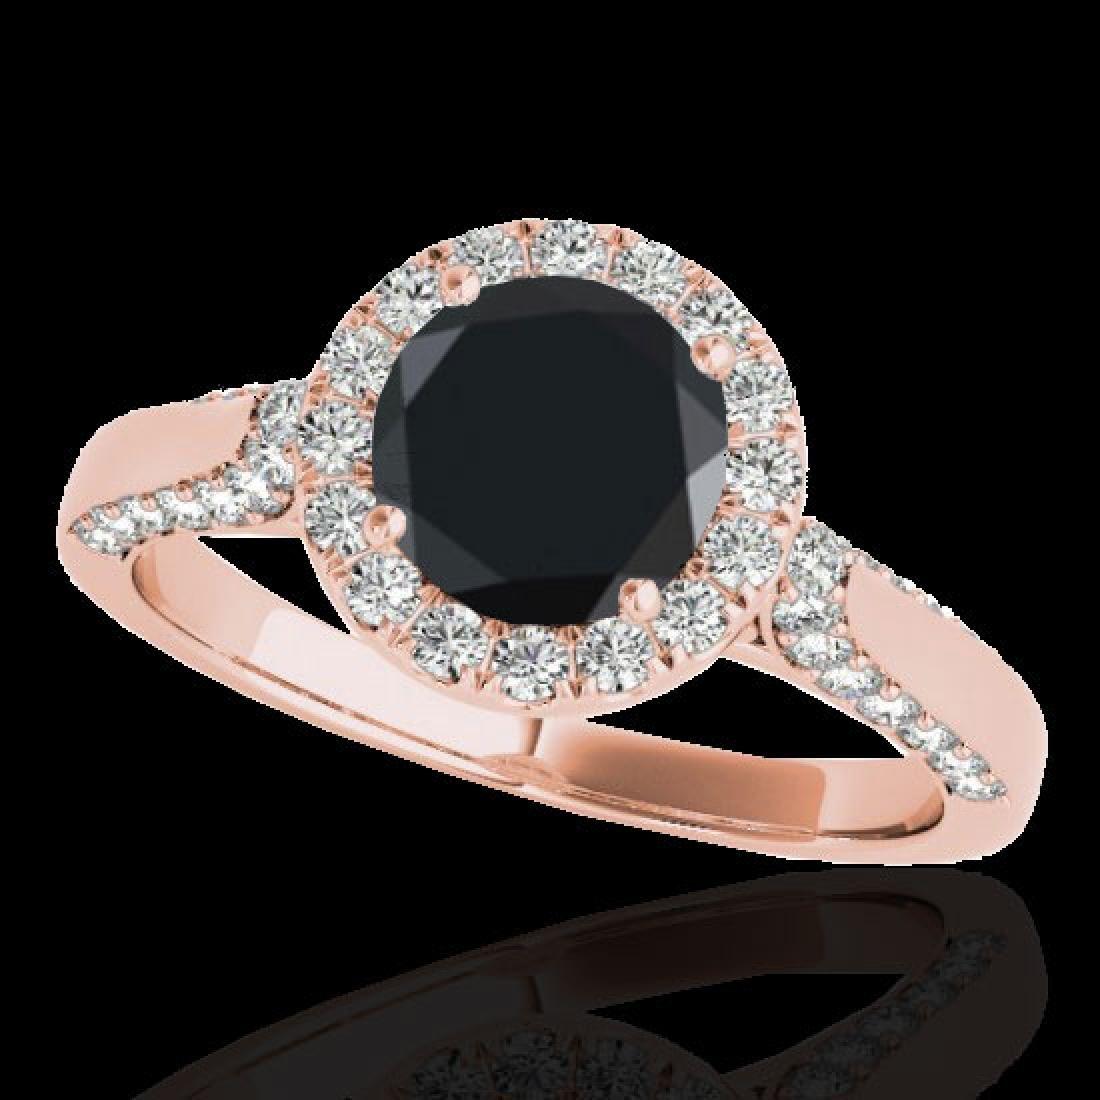 2.15 CTW Certified VS Black Diamond Solitaire Halo Ring